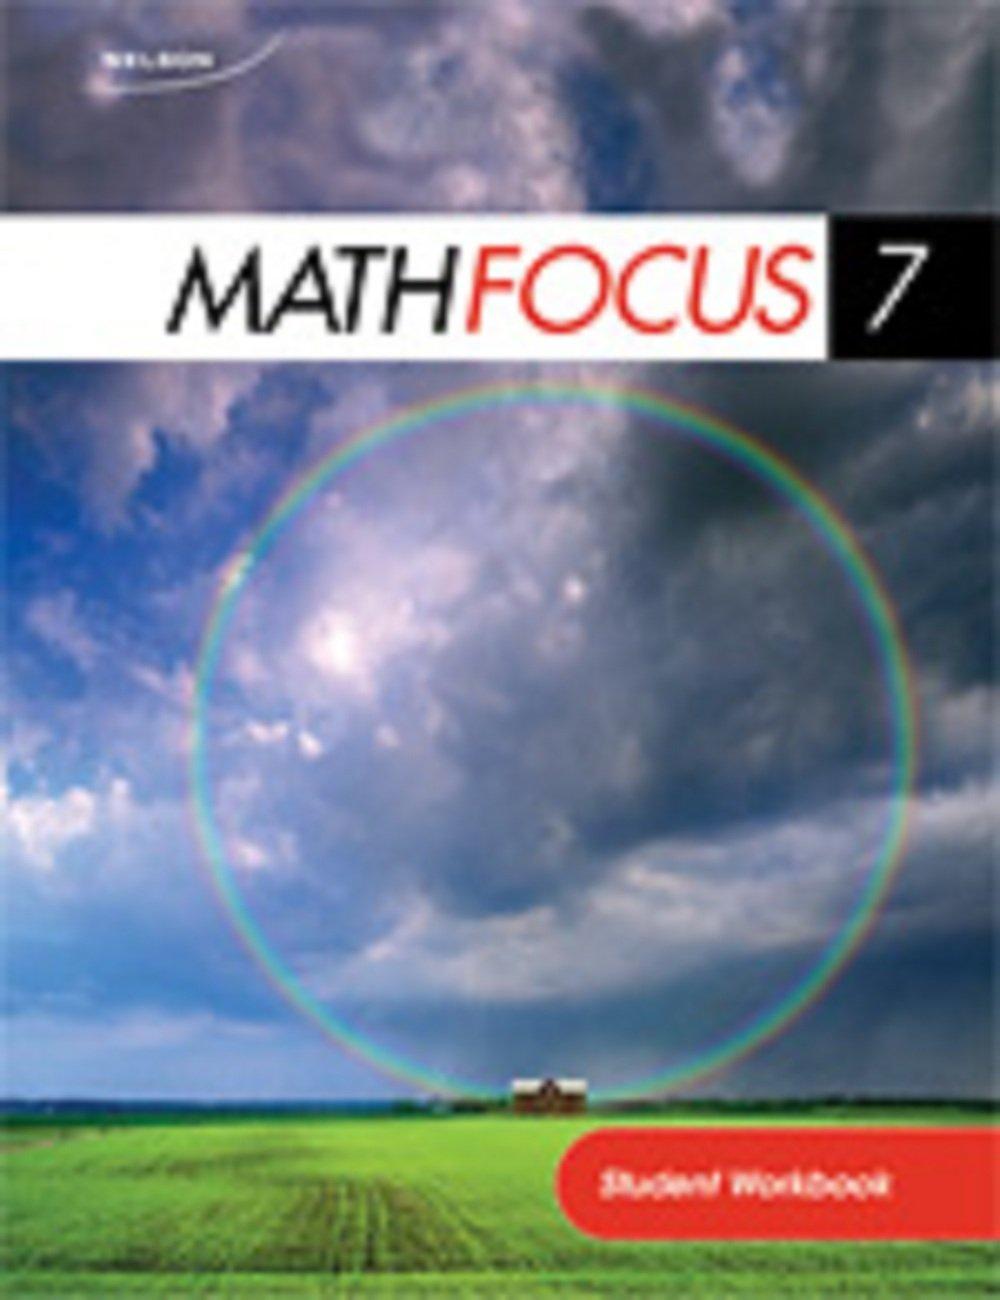 Workbooks nelson mathematics 7 workbook answers pdf : Nelson Math Focus 7: Student Book: Marian Small: 9780176324643 ...